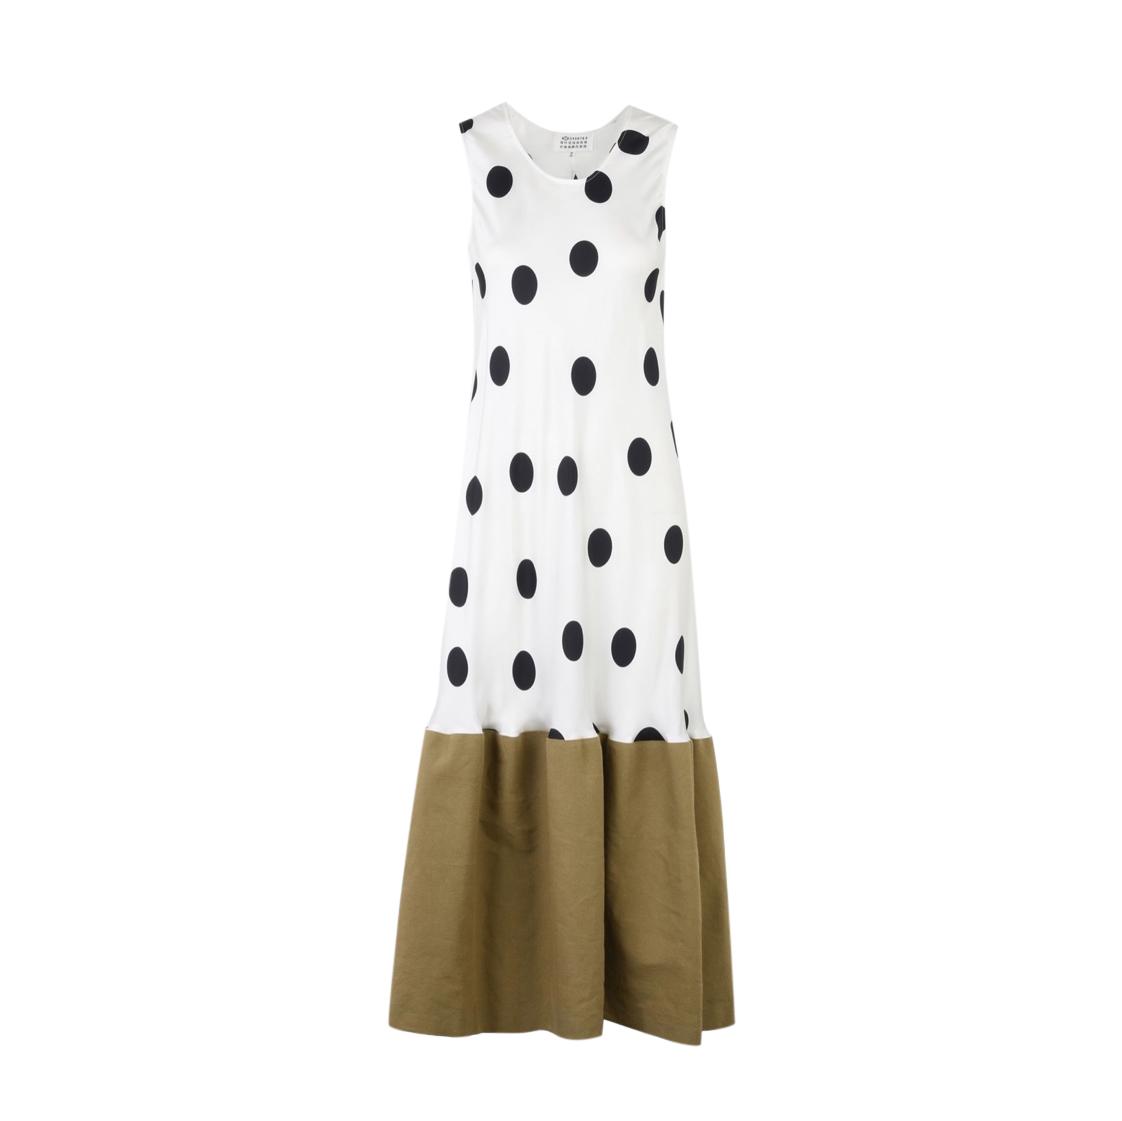 Maison Margiela Contrast Hem Polka Dot Dress